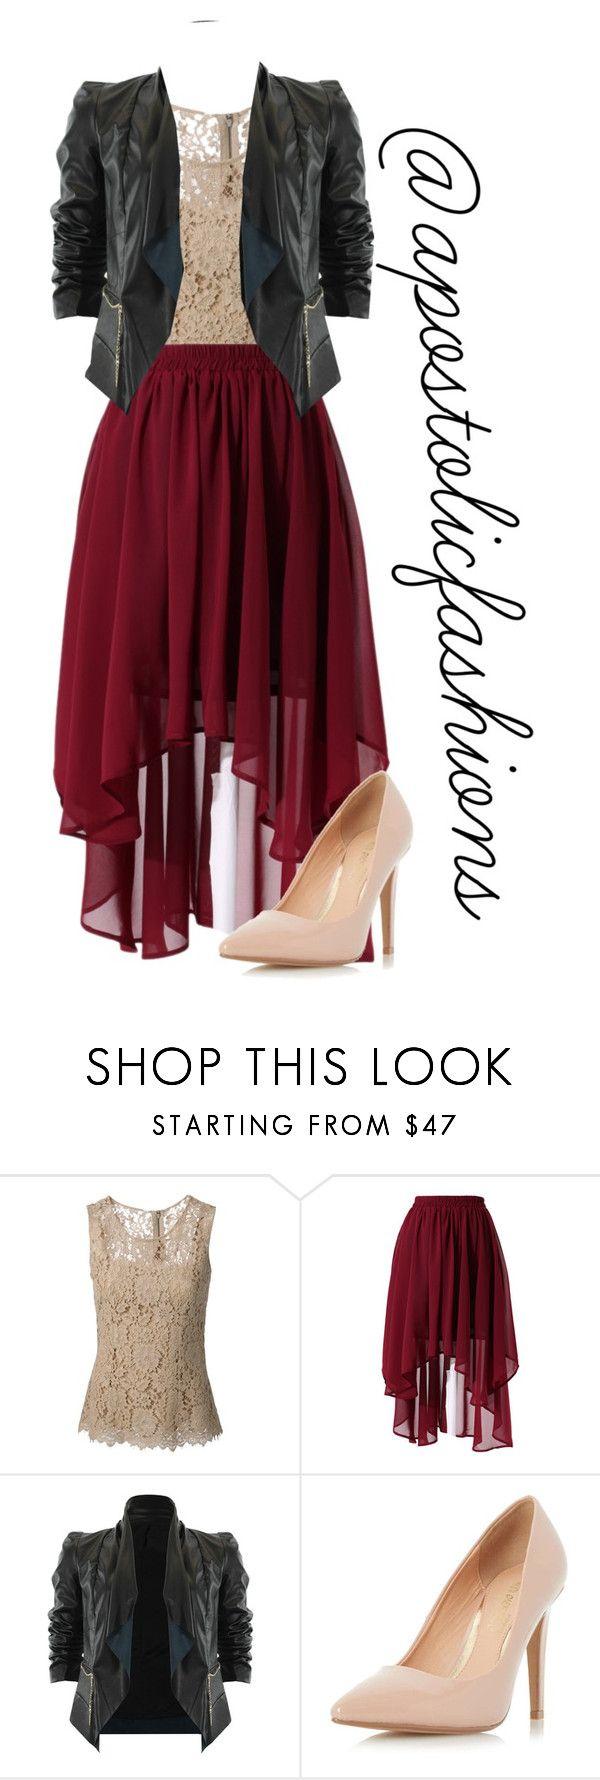 Apostolic Fashions #1370 by apostolicfashions on Polyvore featuring moda, Dolce&Gabbana, Chicwish, Dorothy Perkins, modestlykay and modestlywhit